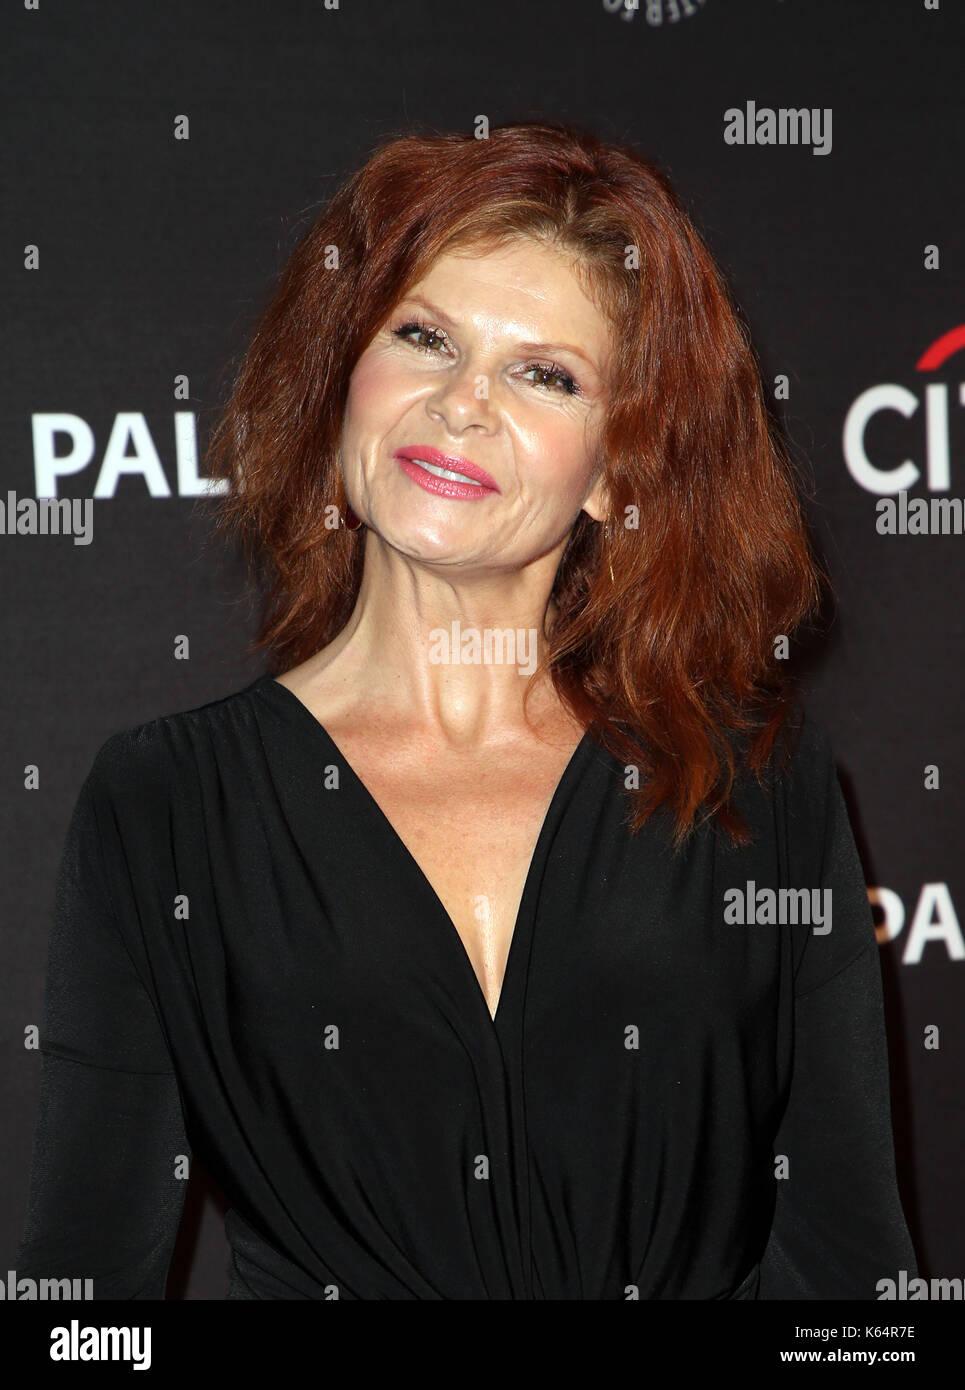 Communication on this topic: Jean Arthur, belladonna-actress/